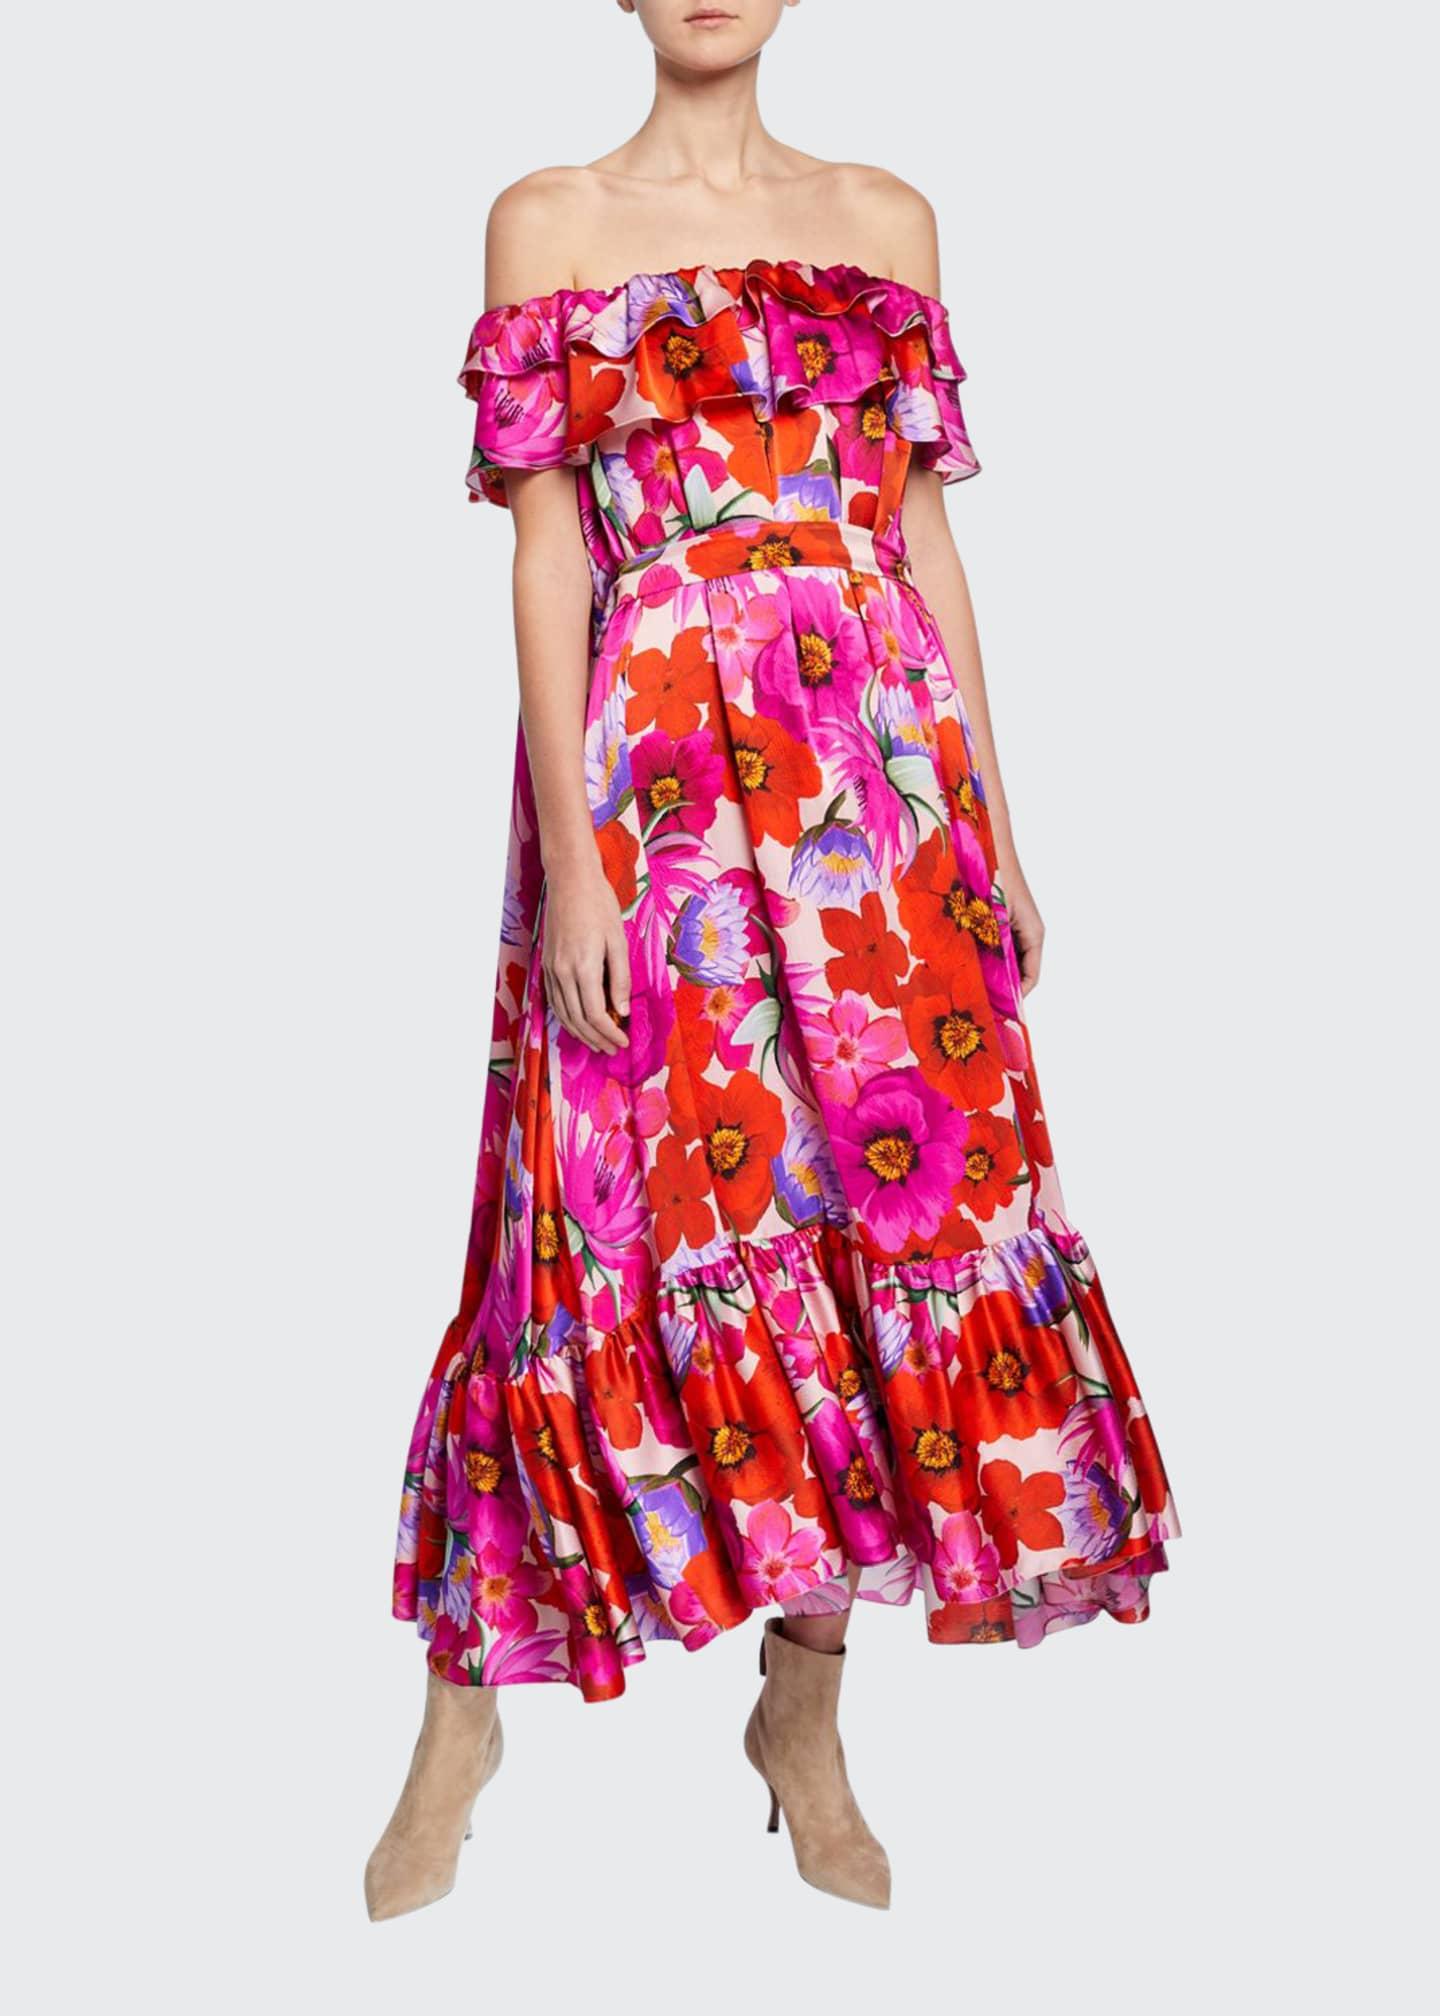 Borgo de Nor Off-the-Shoulder Floral Satin Dress